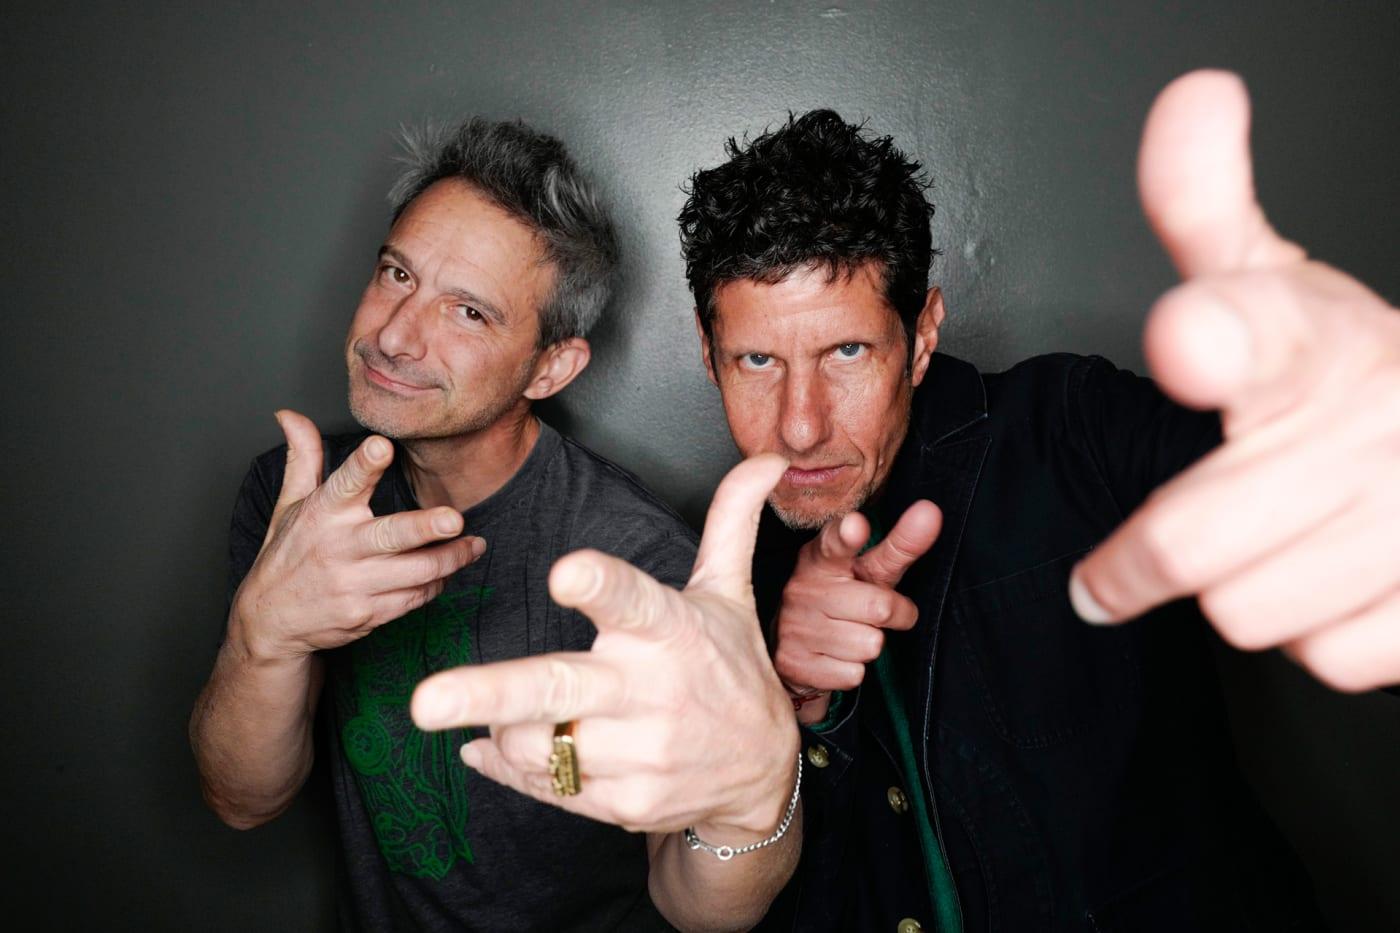 Adam Horovitz and Mike Diamond of the Beastie Boys